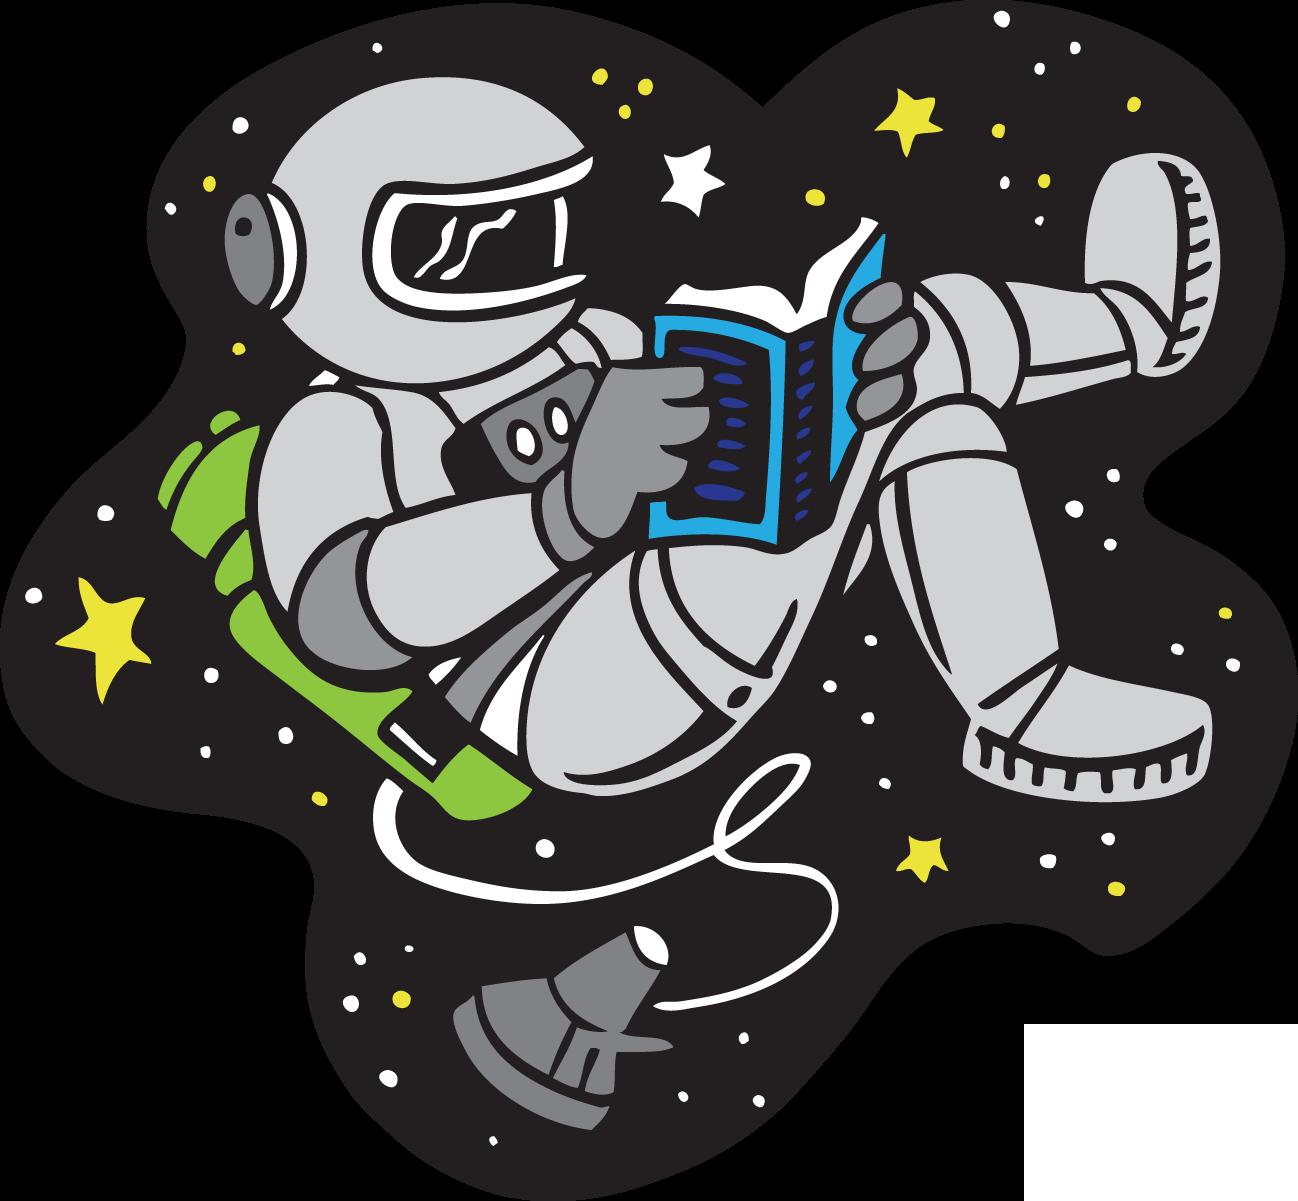 Astronaut book color cbda4410